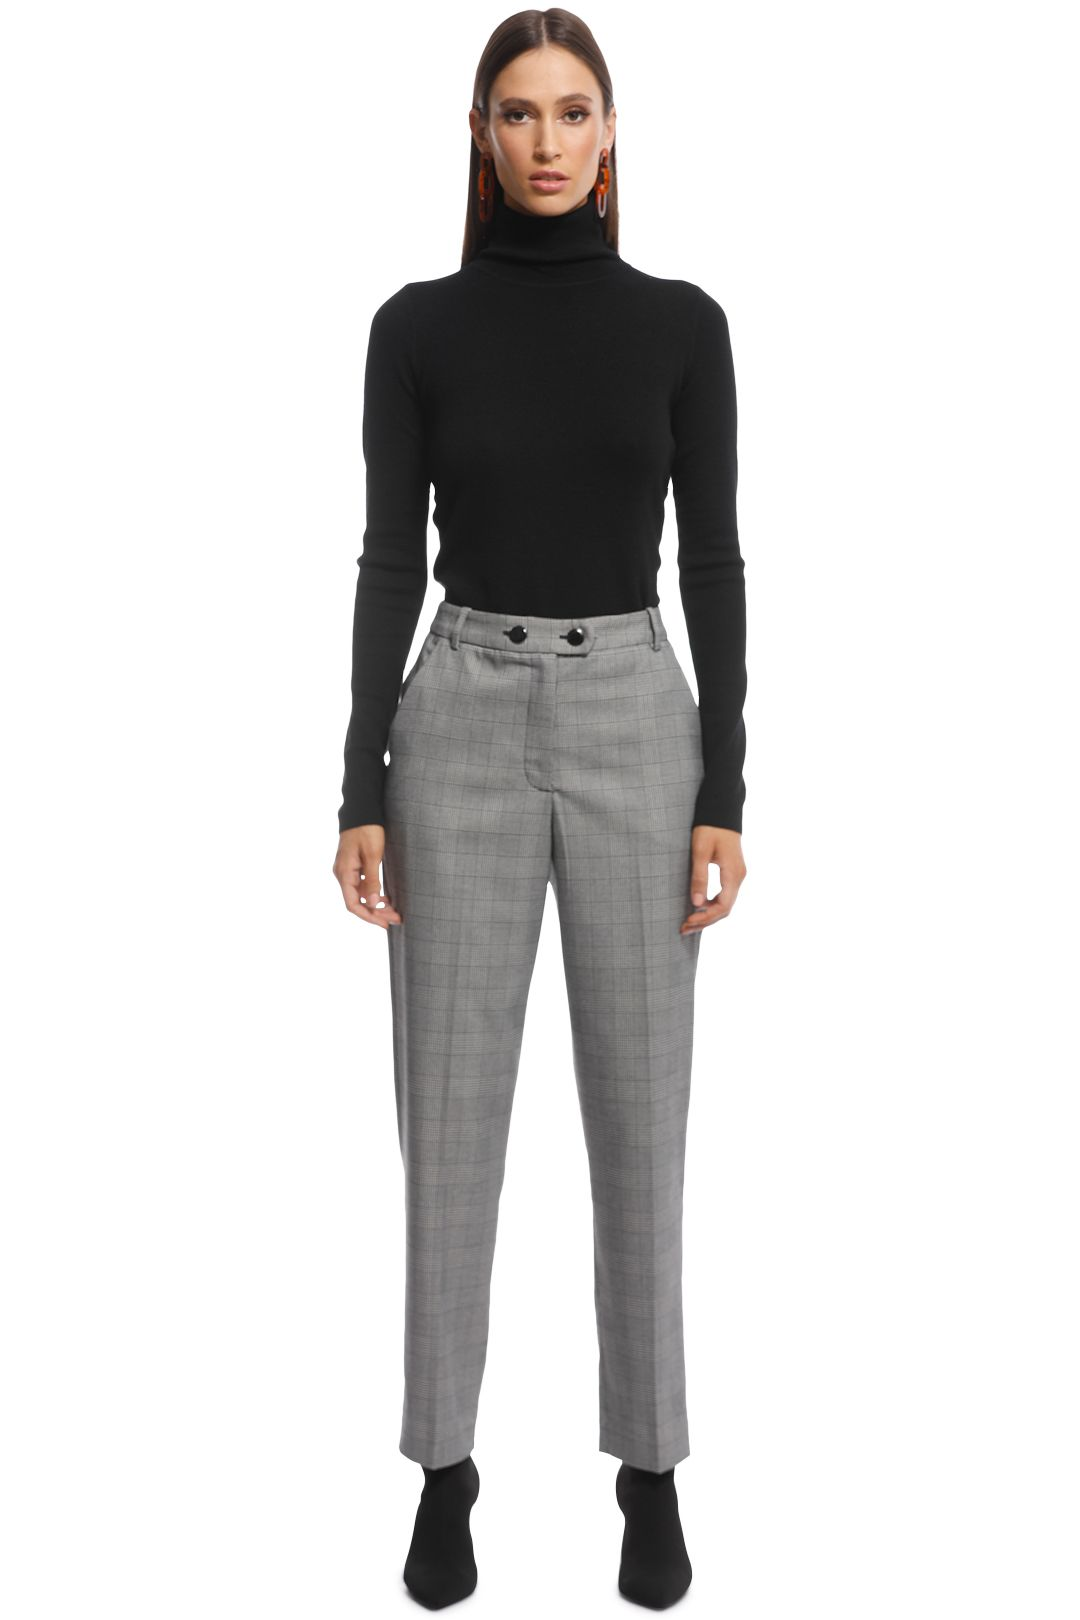 Veronika Maine - Check Slim Pant - Black White - Front